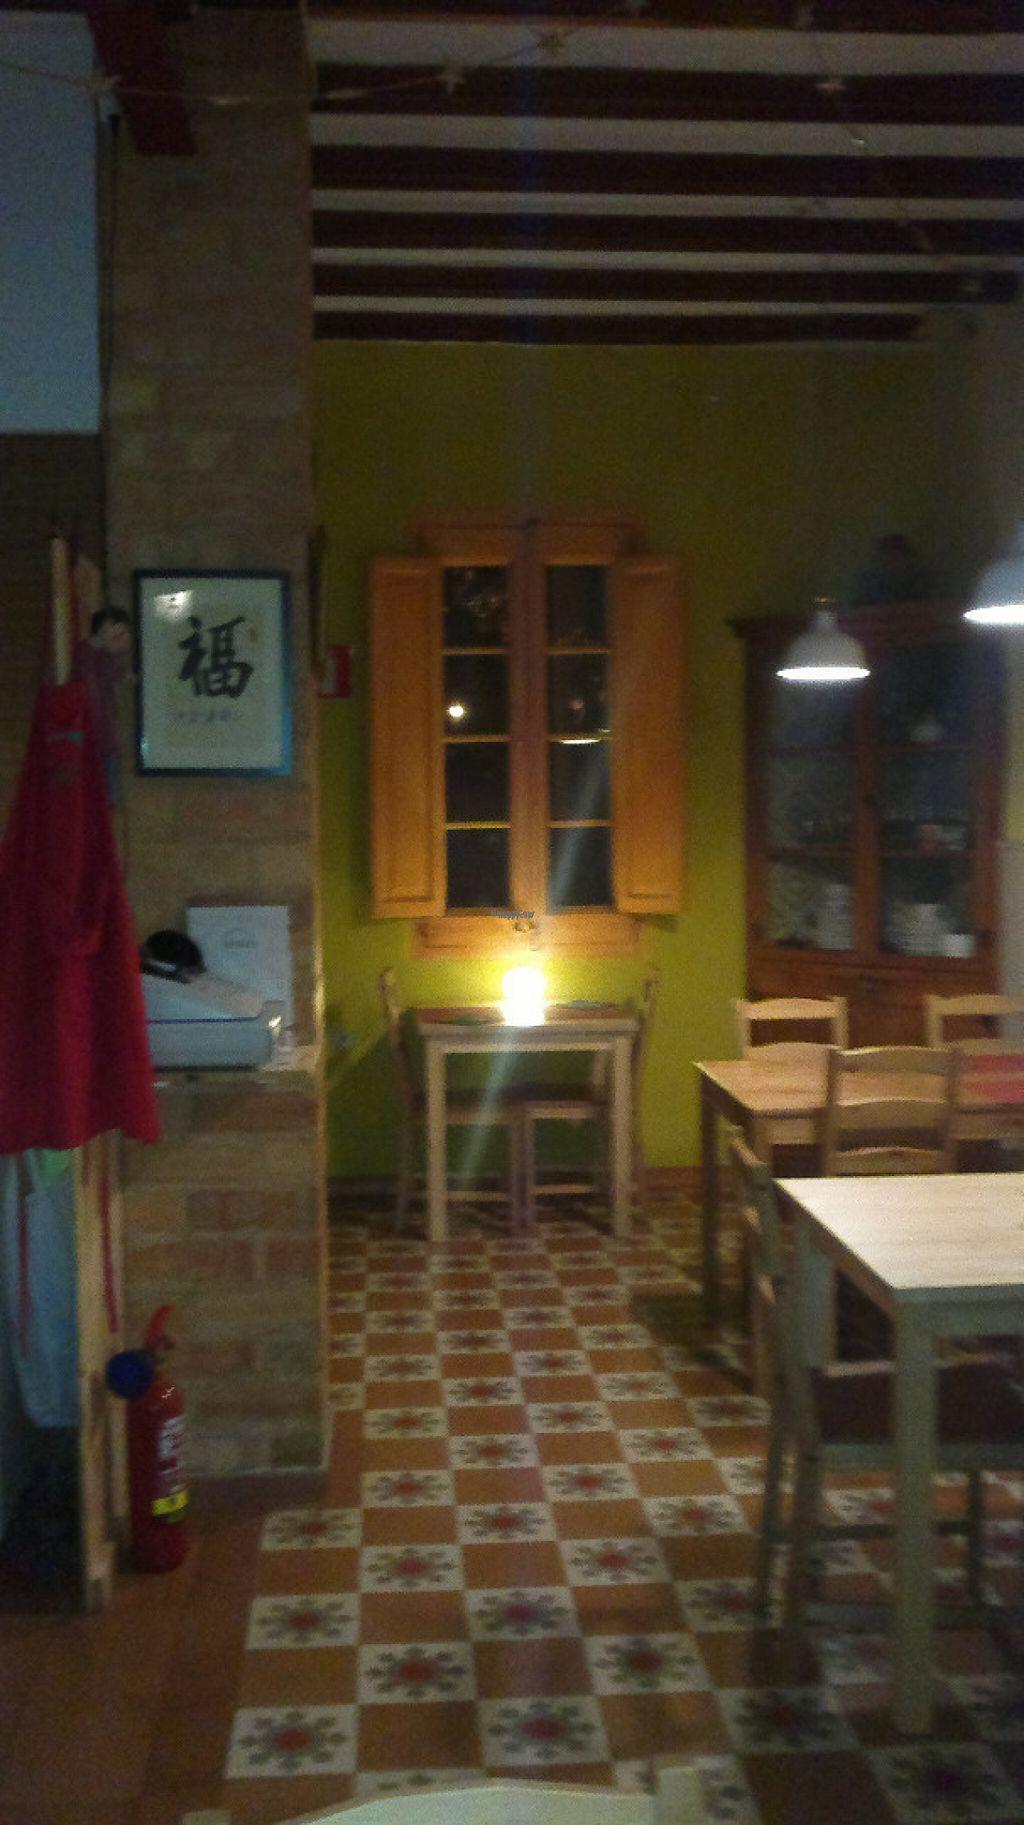 "Photo of CLOSED: El Bistro de Caldes  by <a href=""/members/profile/Titanium"">Titanium</a> <br/>Dinnig room in El Bistró de Caldes.  <br/> August 8, 2016  - <a href='/contact/abuse/image/57171/166861'>Report</a>"